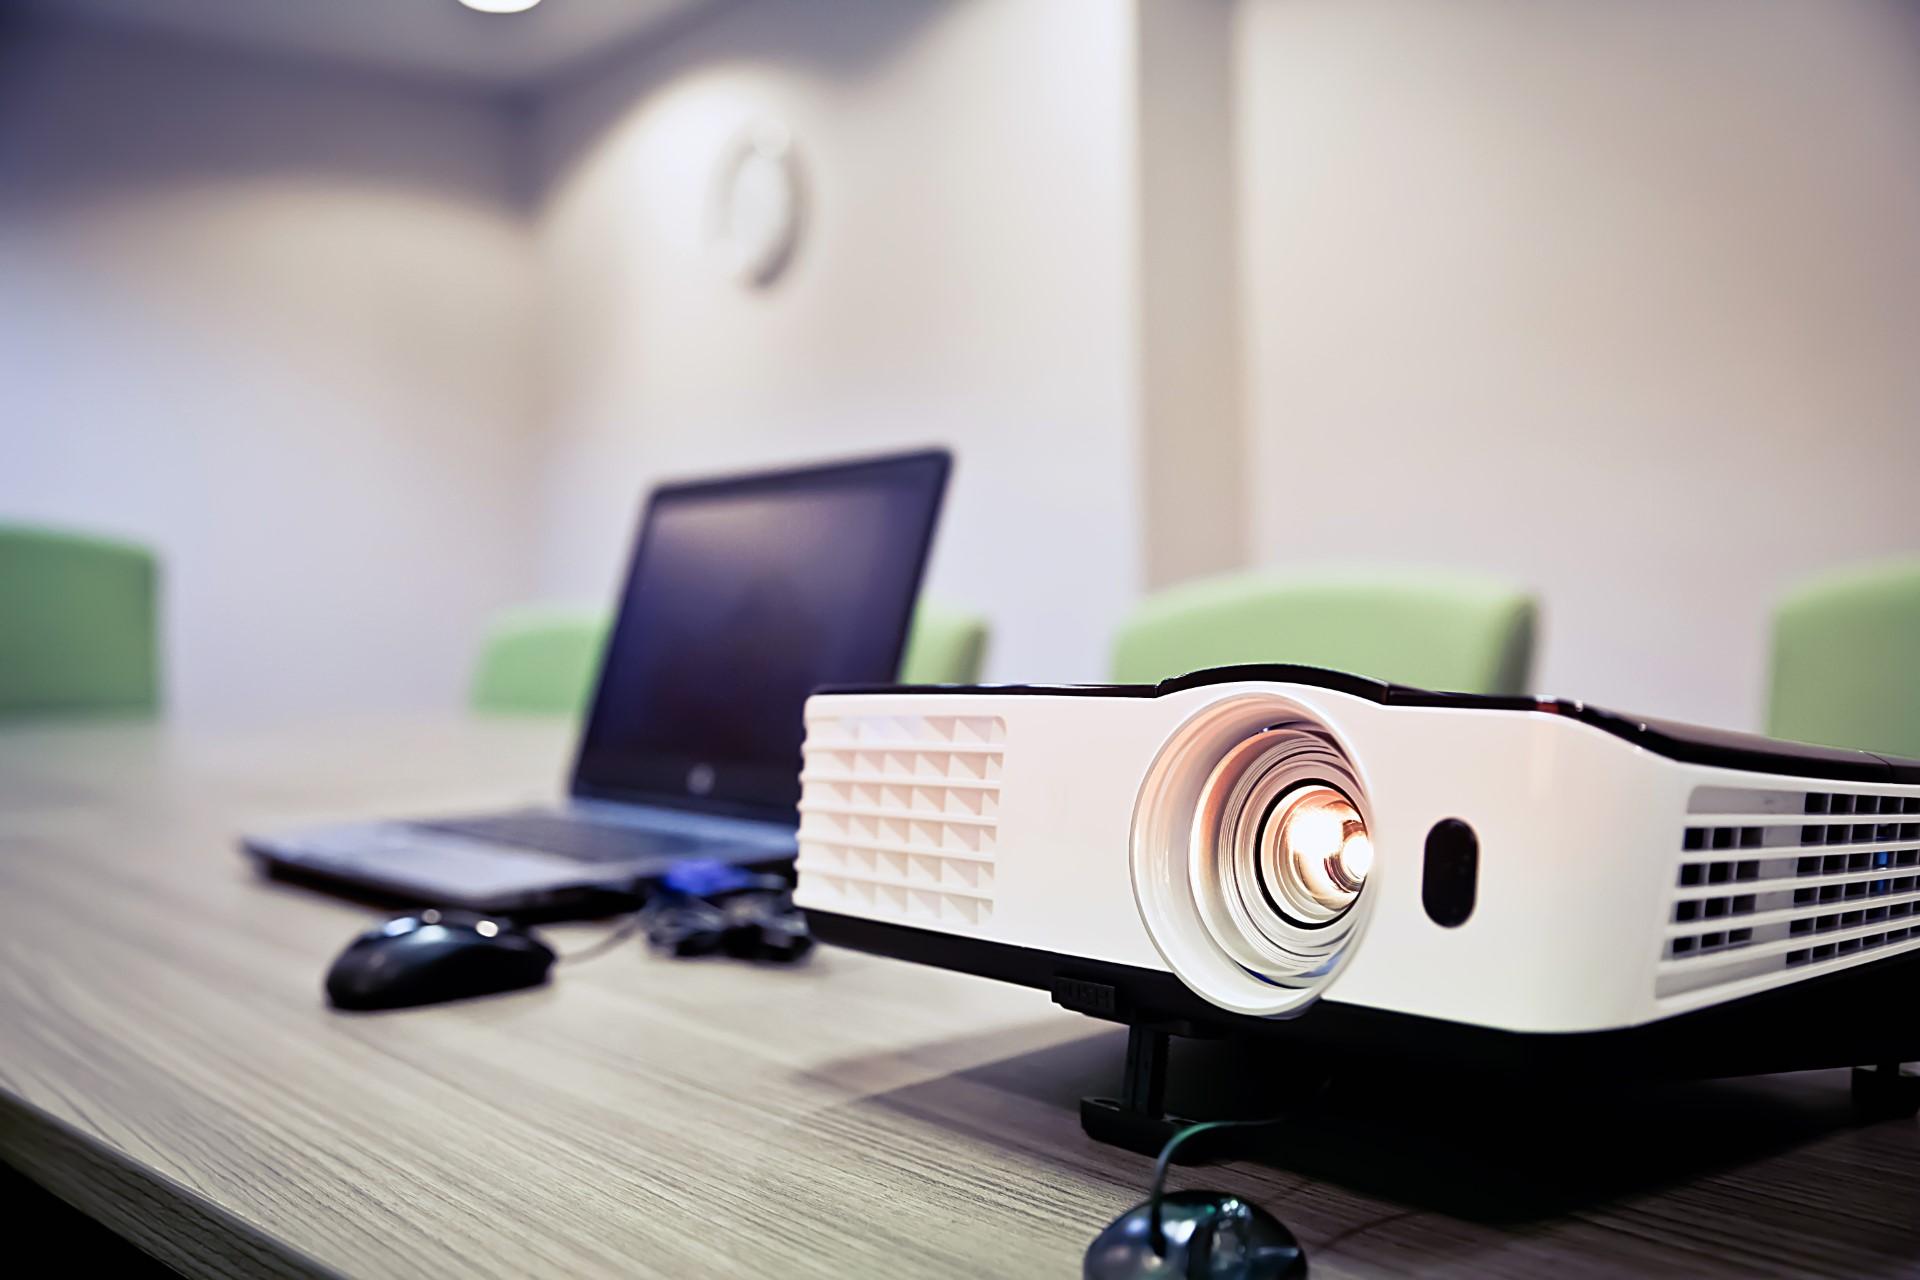 Ultimate Audiovisual - Audiovisual Services & Repairs - Cape Town